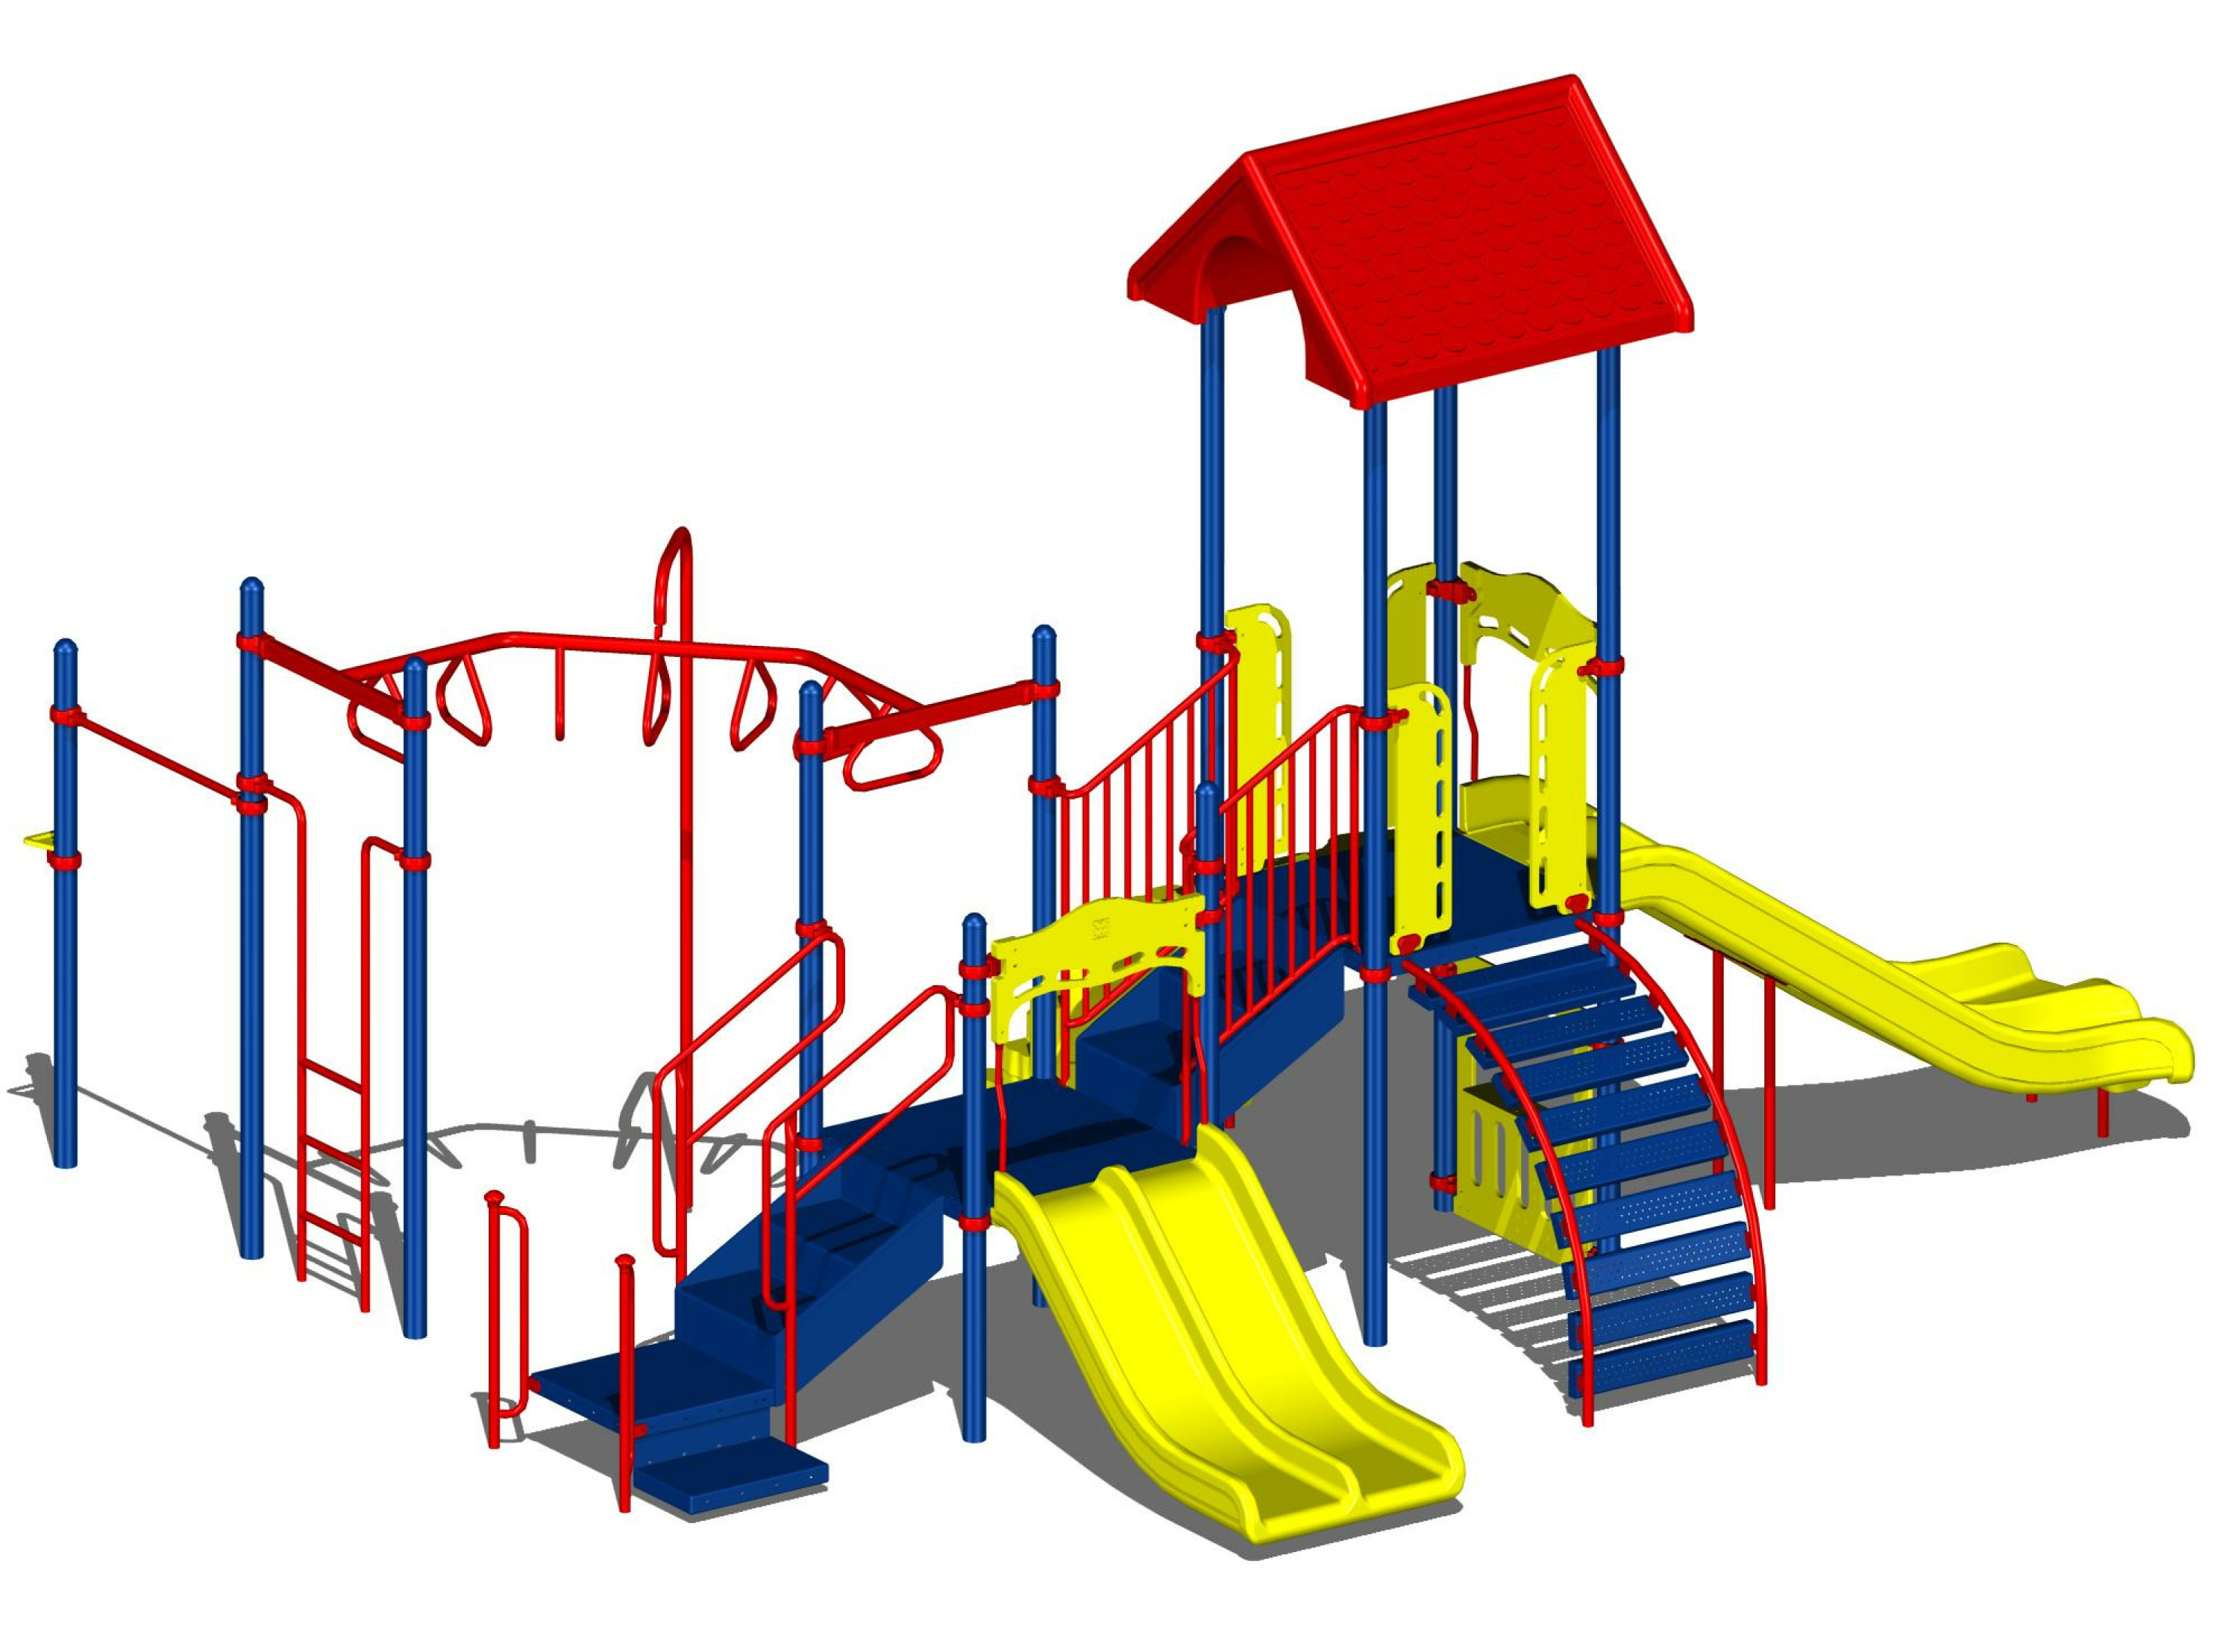 School playground equipment pacific play systems - Los Angeles Playground Equipment Company Completes San